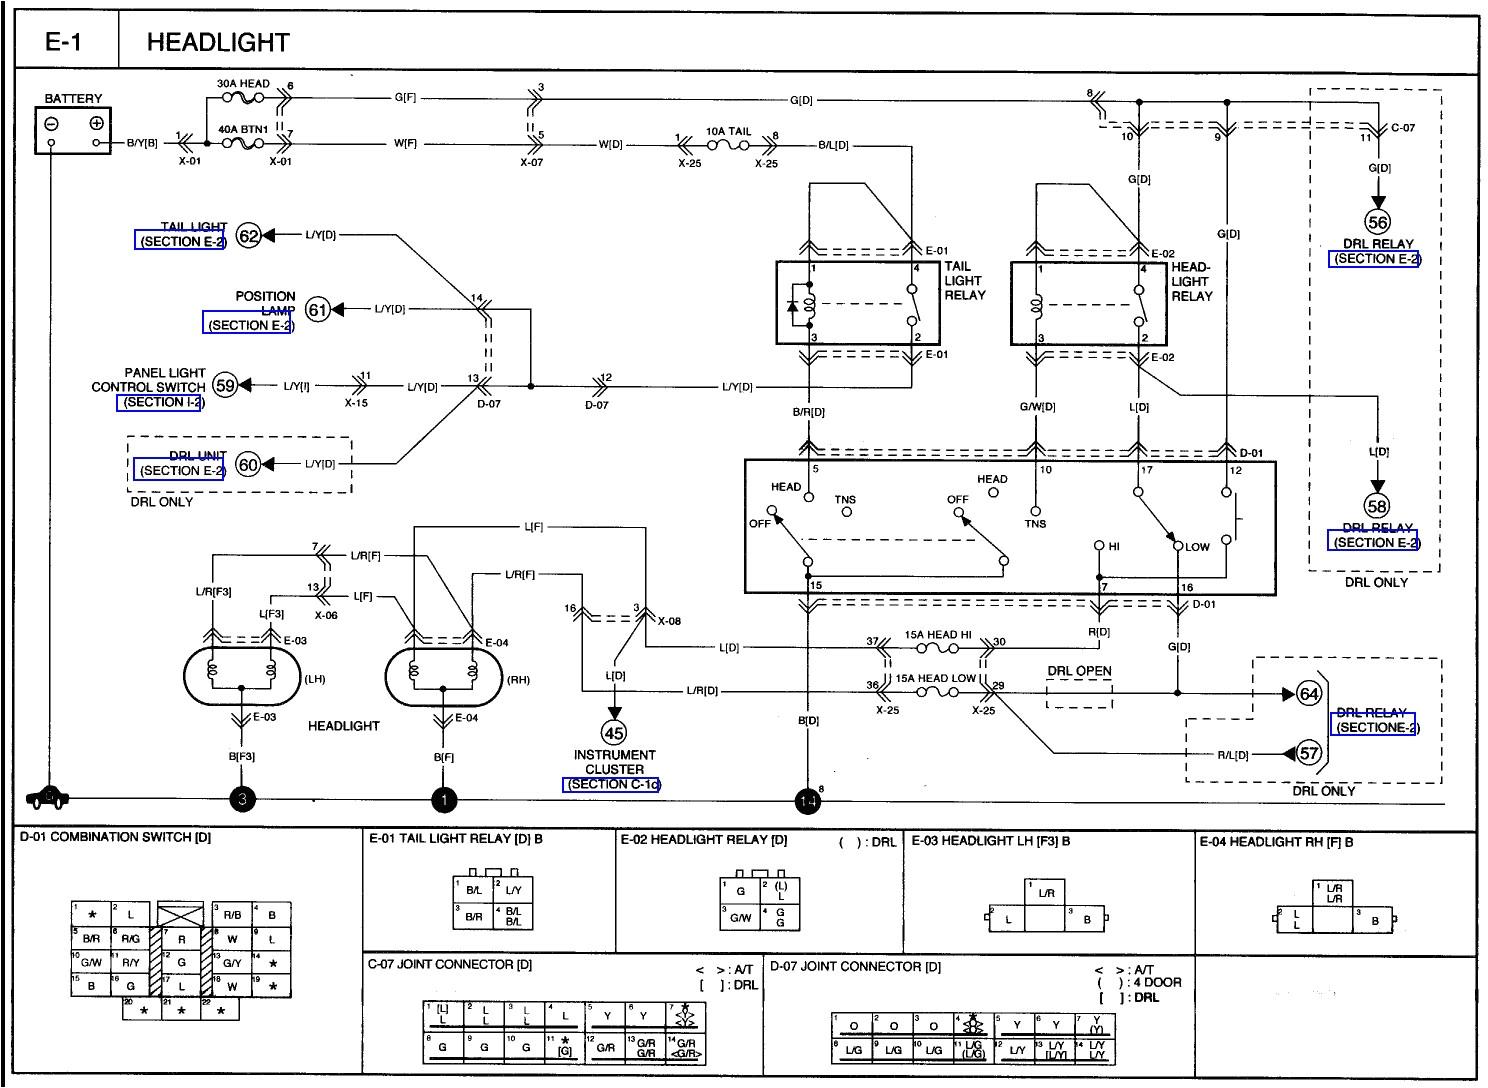 kia wiring harnesses wiring diagram load kia rio wiring harness diagram kia wiring harness diagram